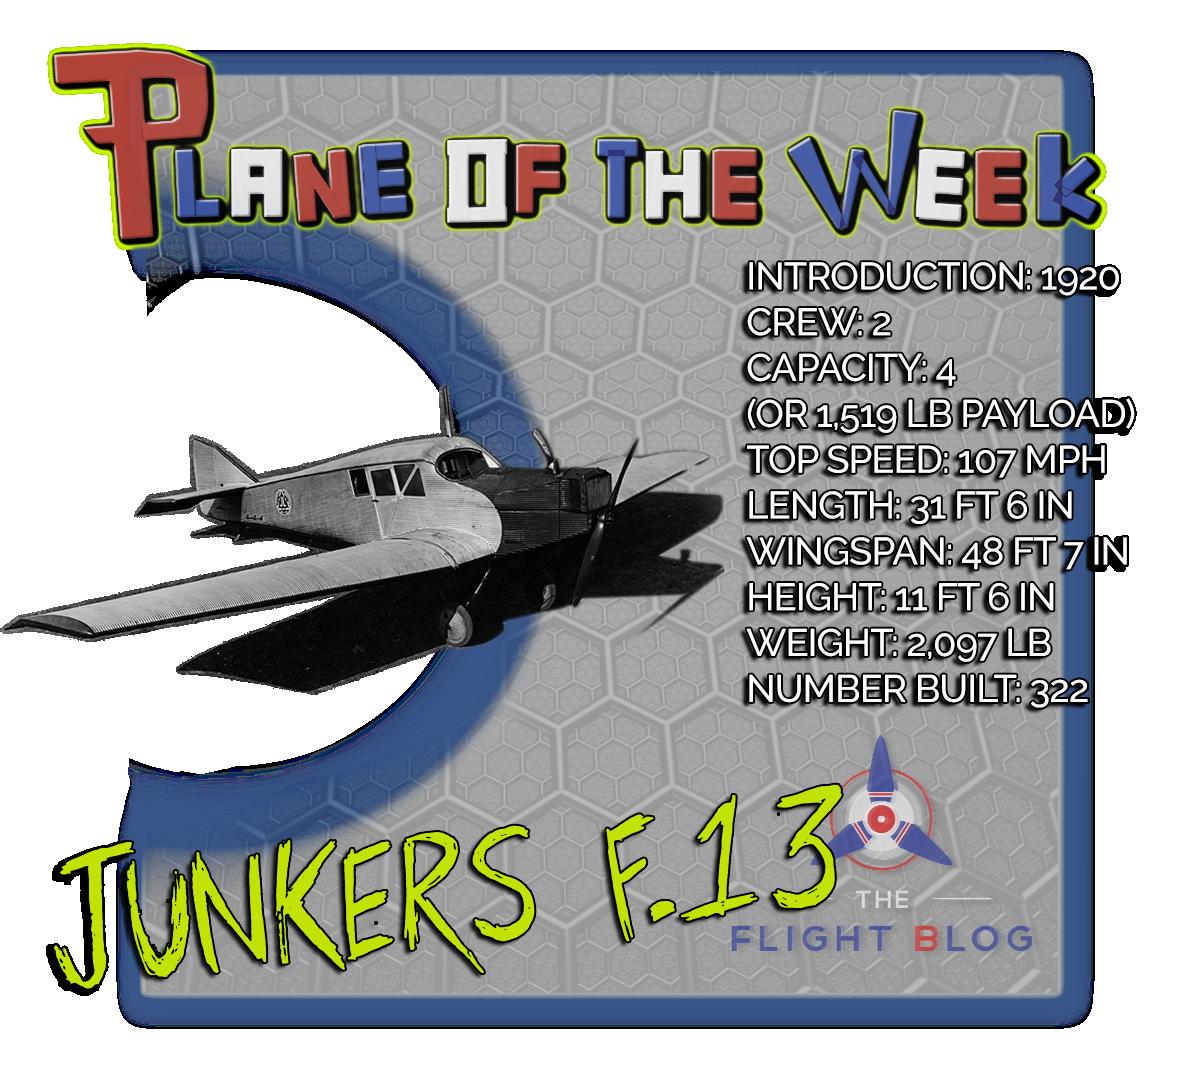 junkers f.13, junkers f13, plane of the week, plane specs, f13 specs